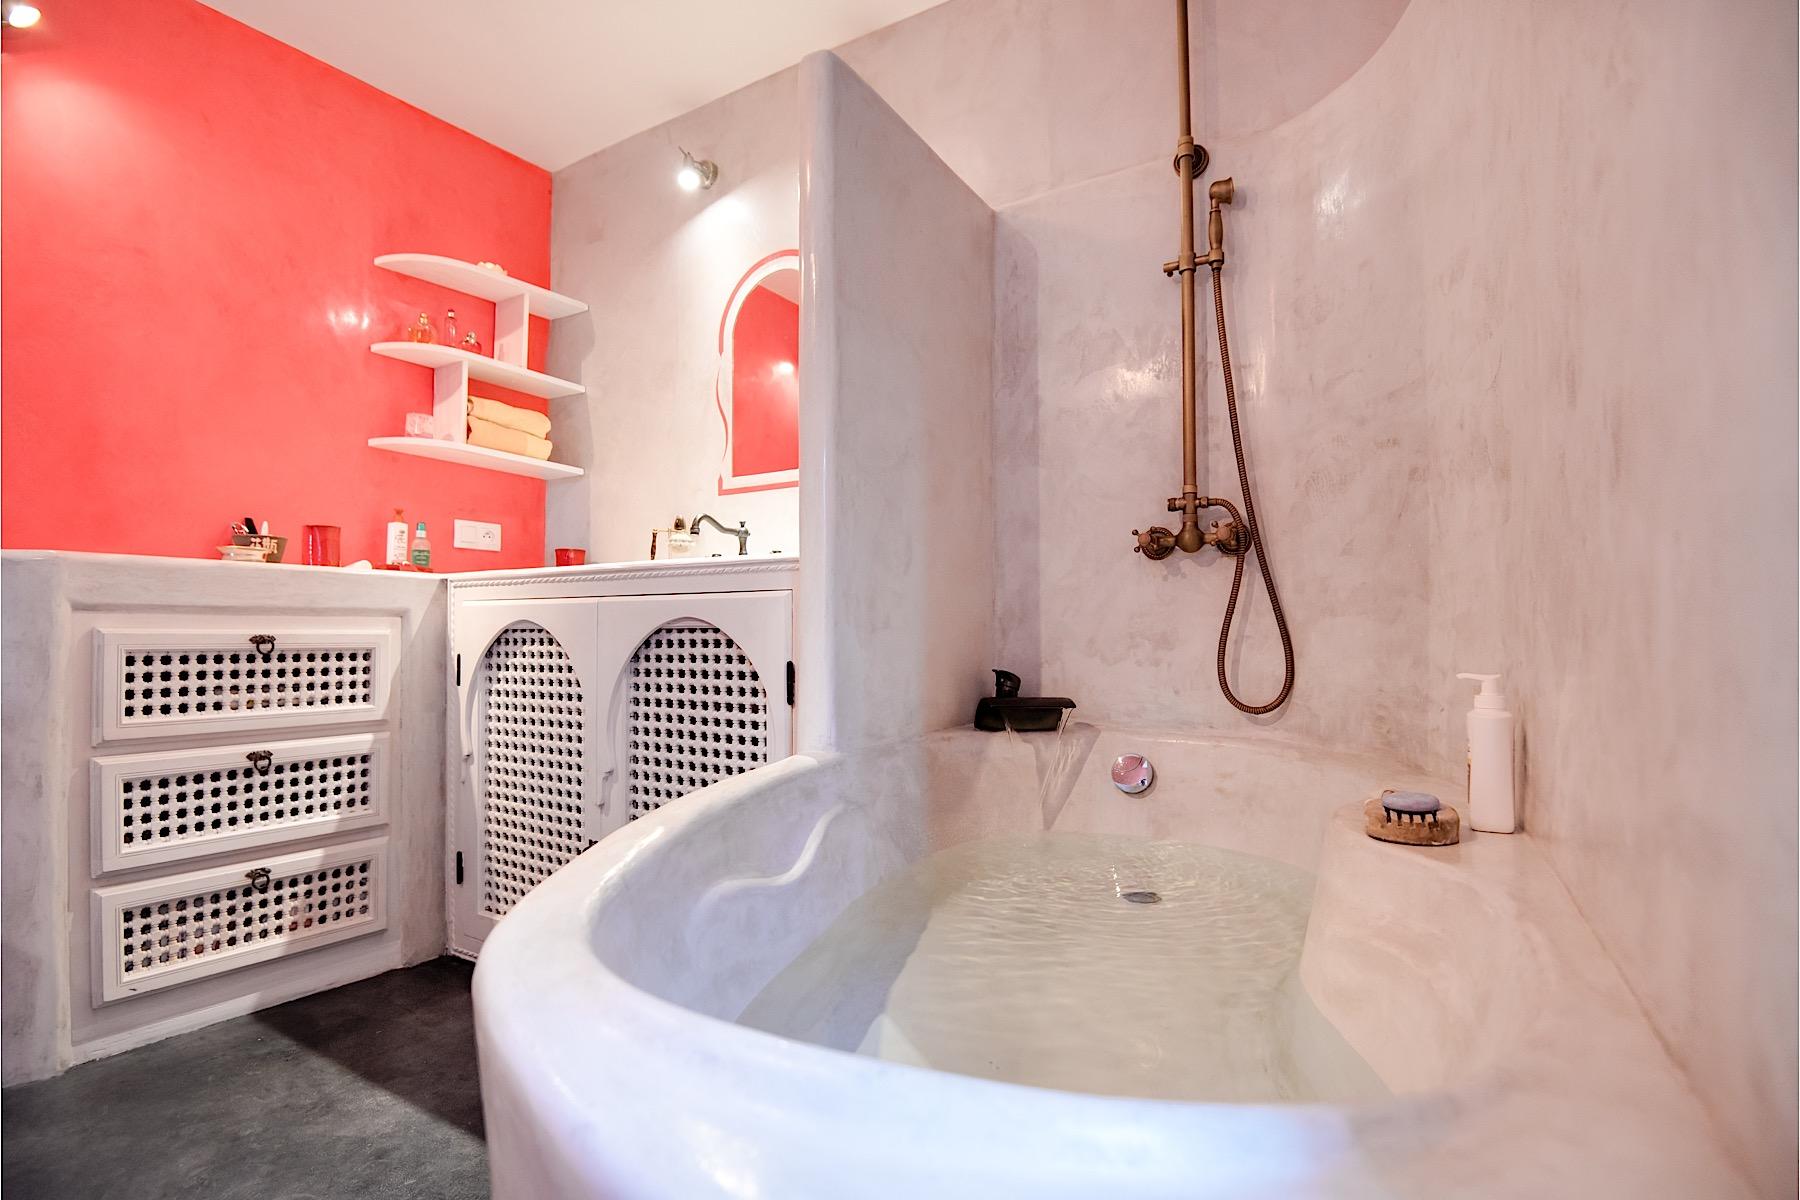 artisan salle de bain. Black Bedroom Furniture Sets. Home Design Ideas